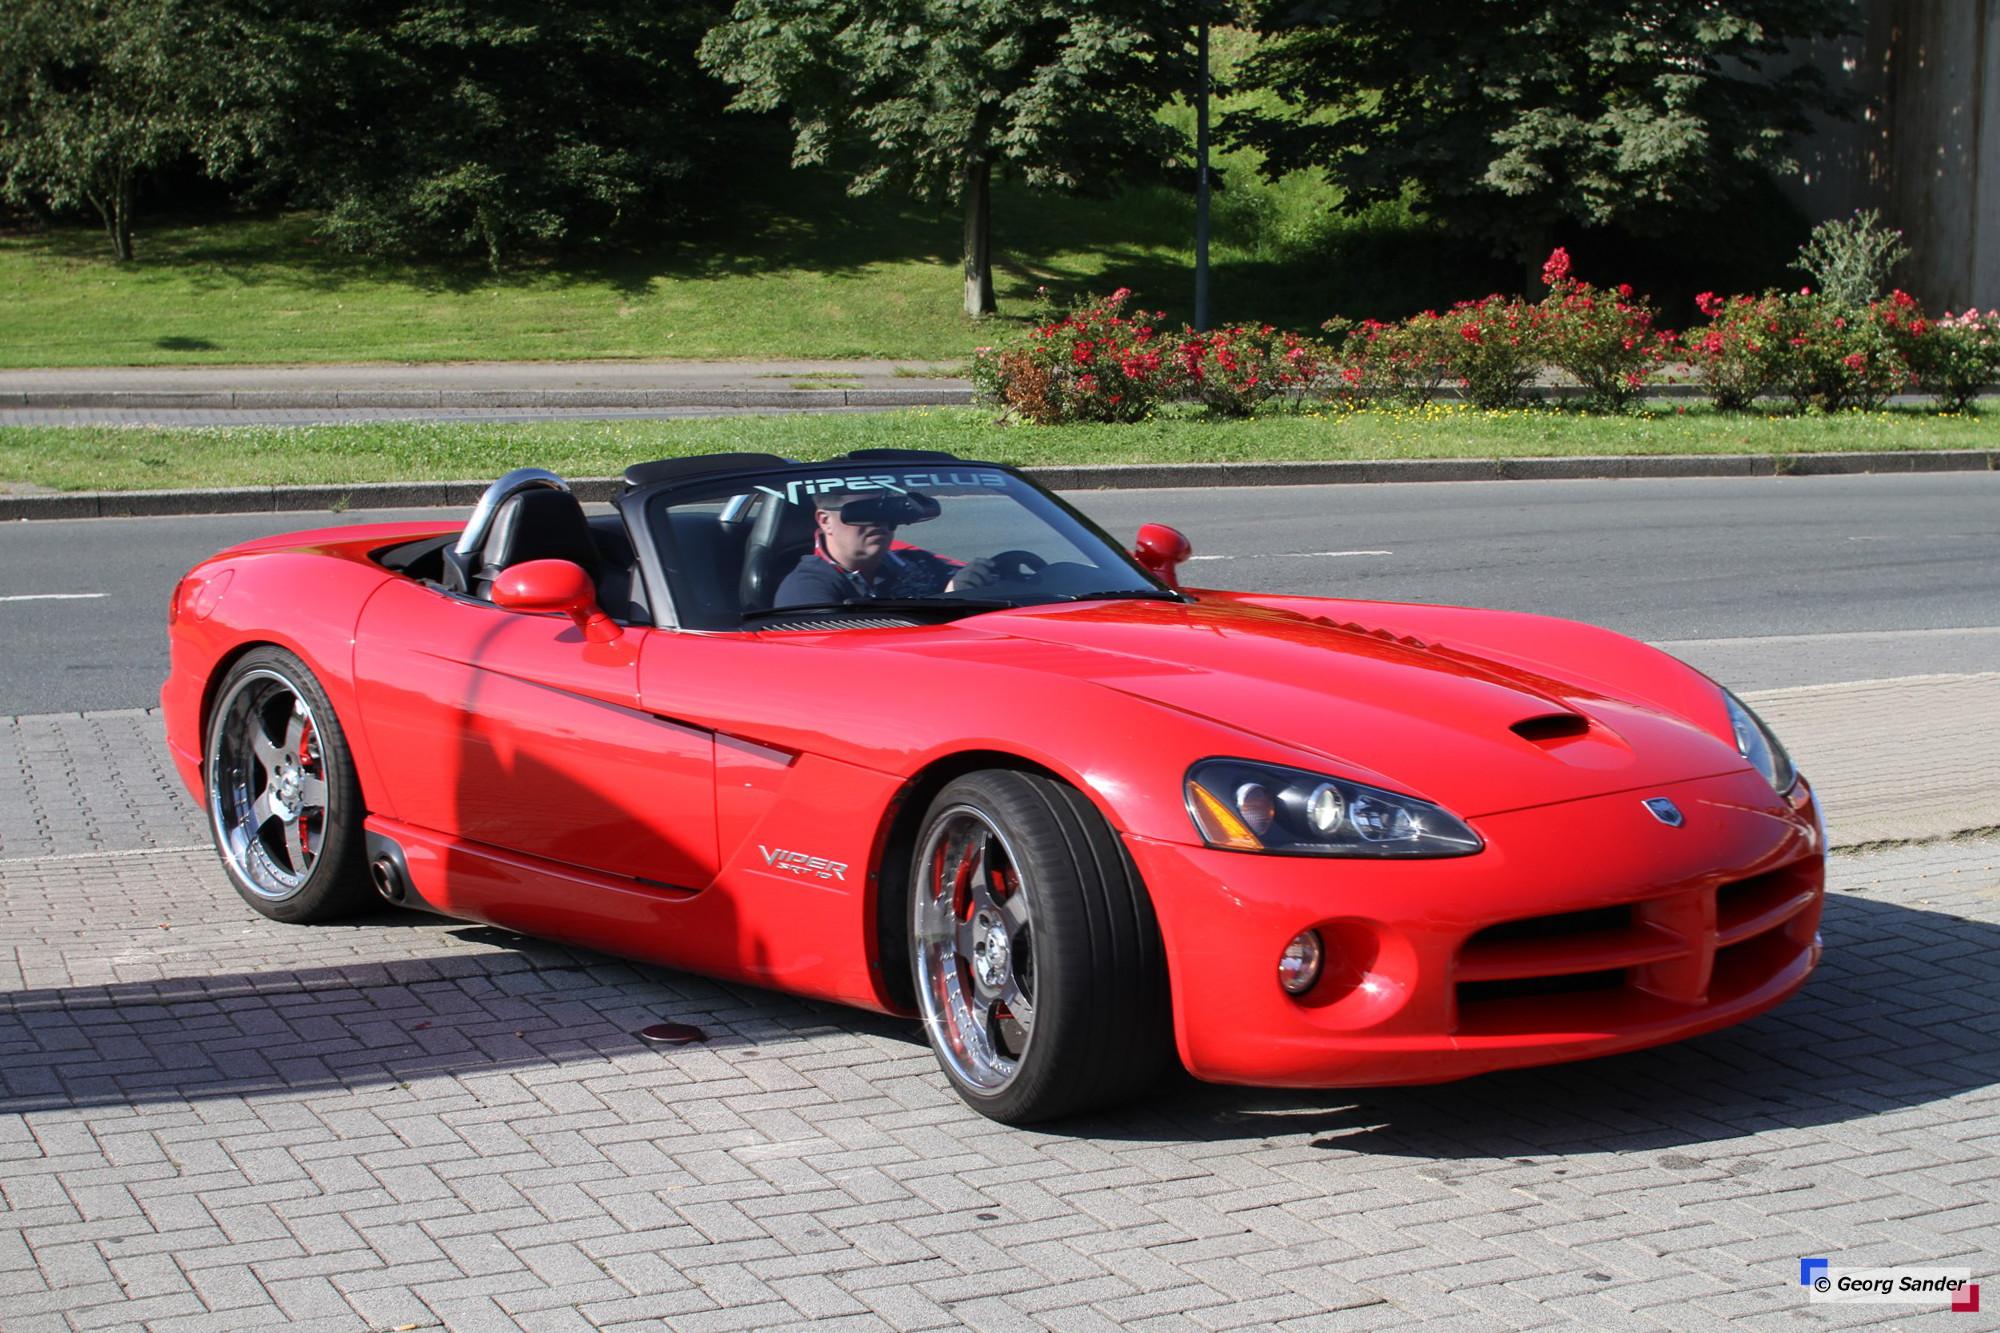 Attractive Wallpaper : Old, Red, Sports Car, Dodge Viper, VIPER, Oldtimer, Performance  Car, 2010, Alt, SRT10, 2003, Mark, Mk, Photo, Wheel, Cars, Mobil, Auto,  Series, ...